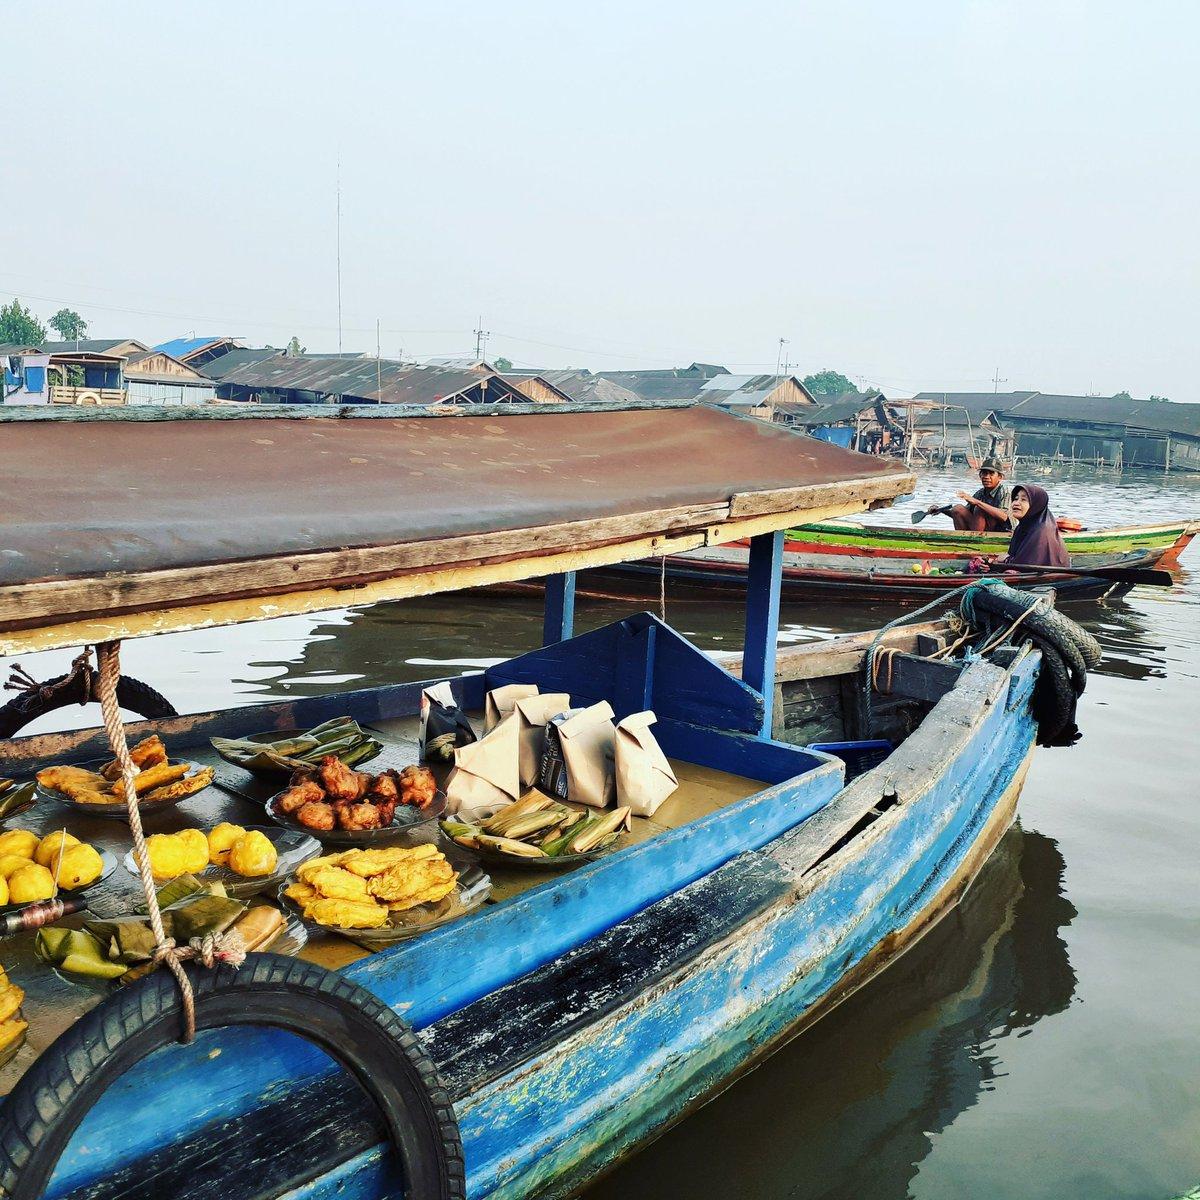 The breakfast boat at  #floating Market  #Banjarmasin #Indonesia #banjarmasintour #wisatabanjarmasin  #wisatakebanjarmasin #tourguide #tour #travel #world  #wereld #monde #mundo #touristguidebanjarmasin #guidebanjarmasin #pemanduwisatadibanjarmasin #pakettourbanjarmasin #wisatapic.twitter.com/EJmXS1NErP